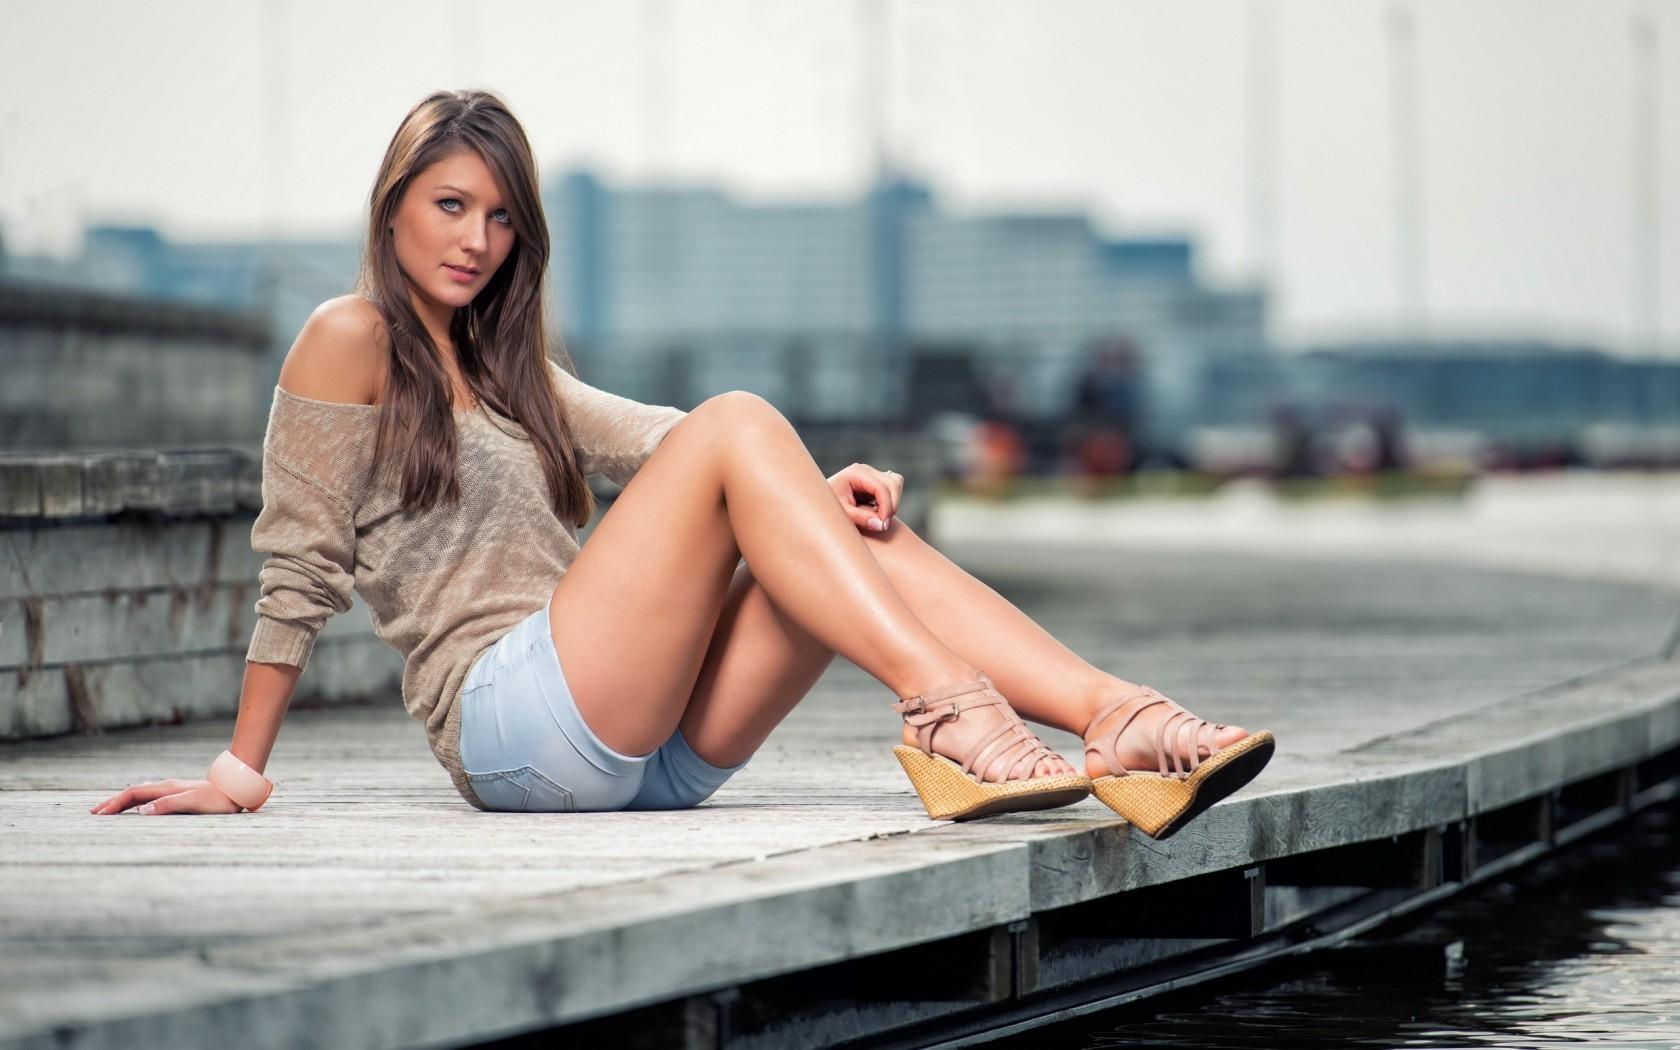 Hot pretty woman, astralia girls pron